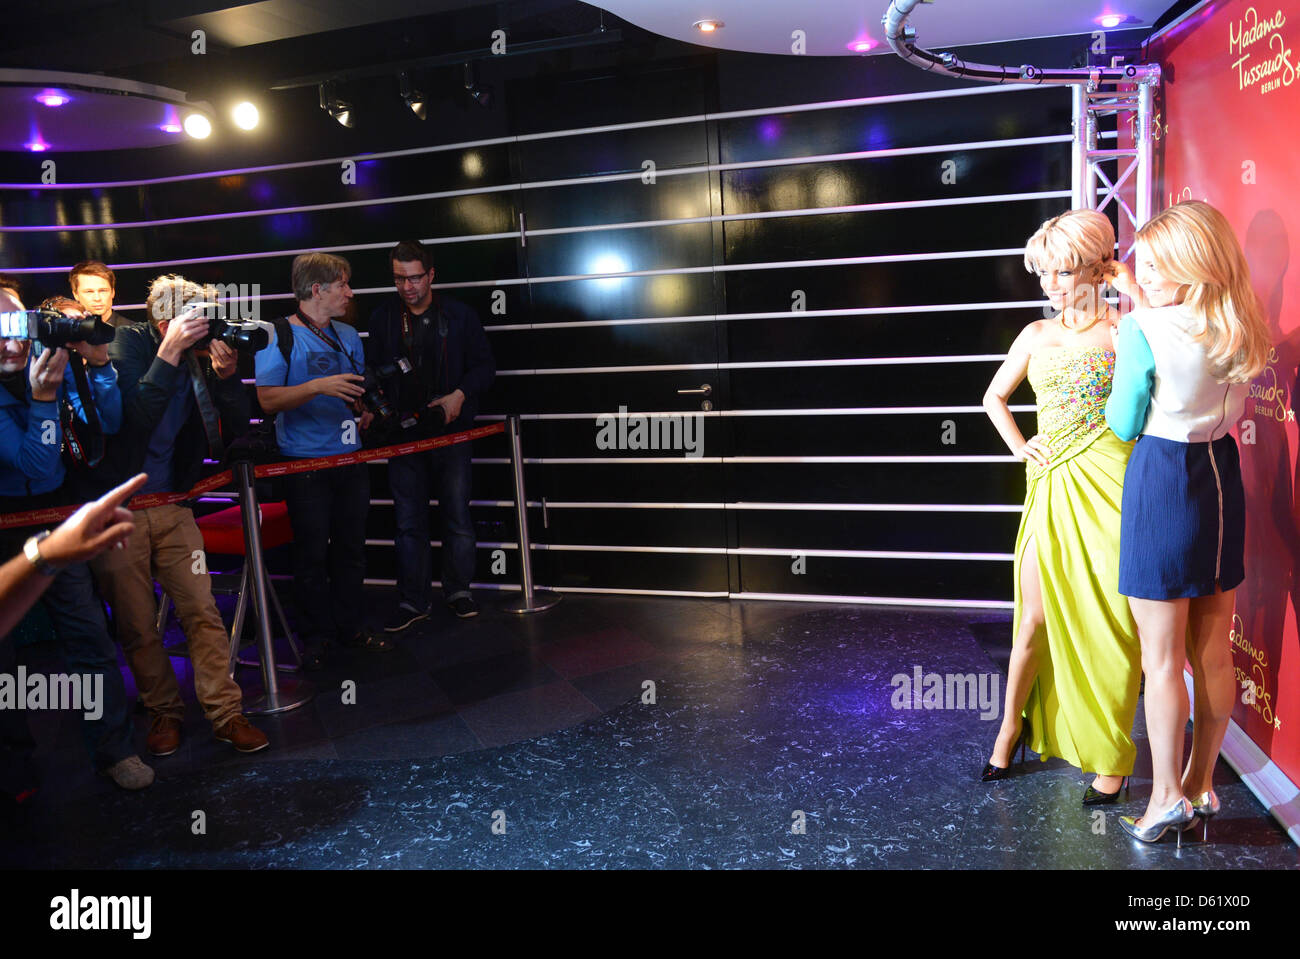 TVpersonality and model Sylvie van der Vaart (R) presents her wax likeness at Madame Tussaud's in Berlin, - Stock Image